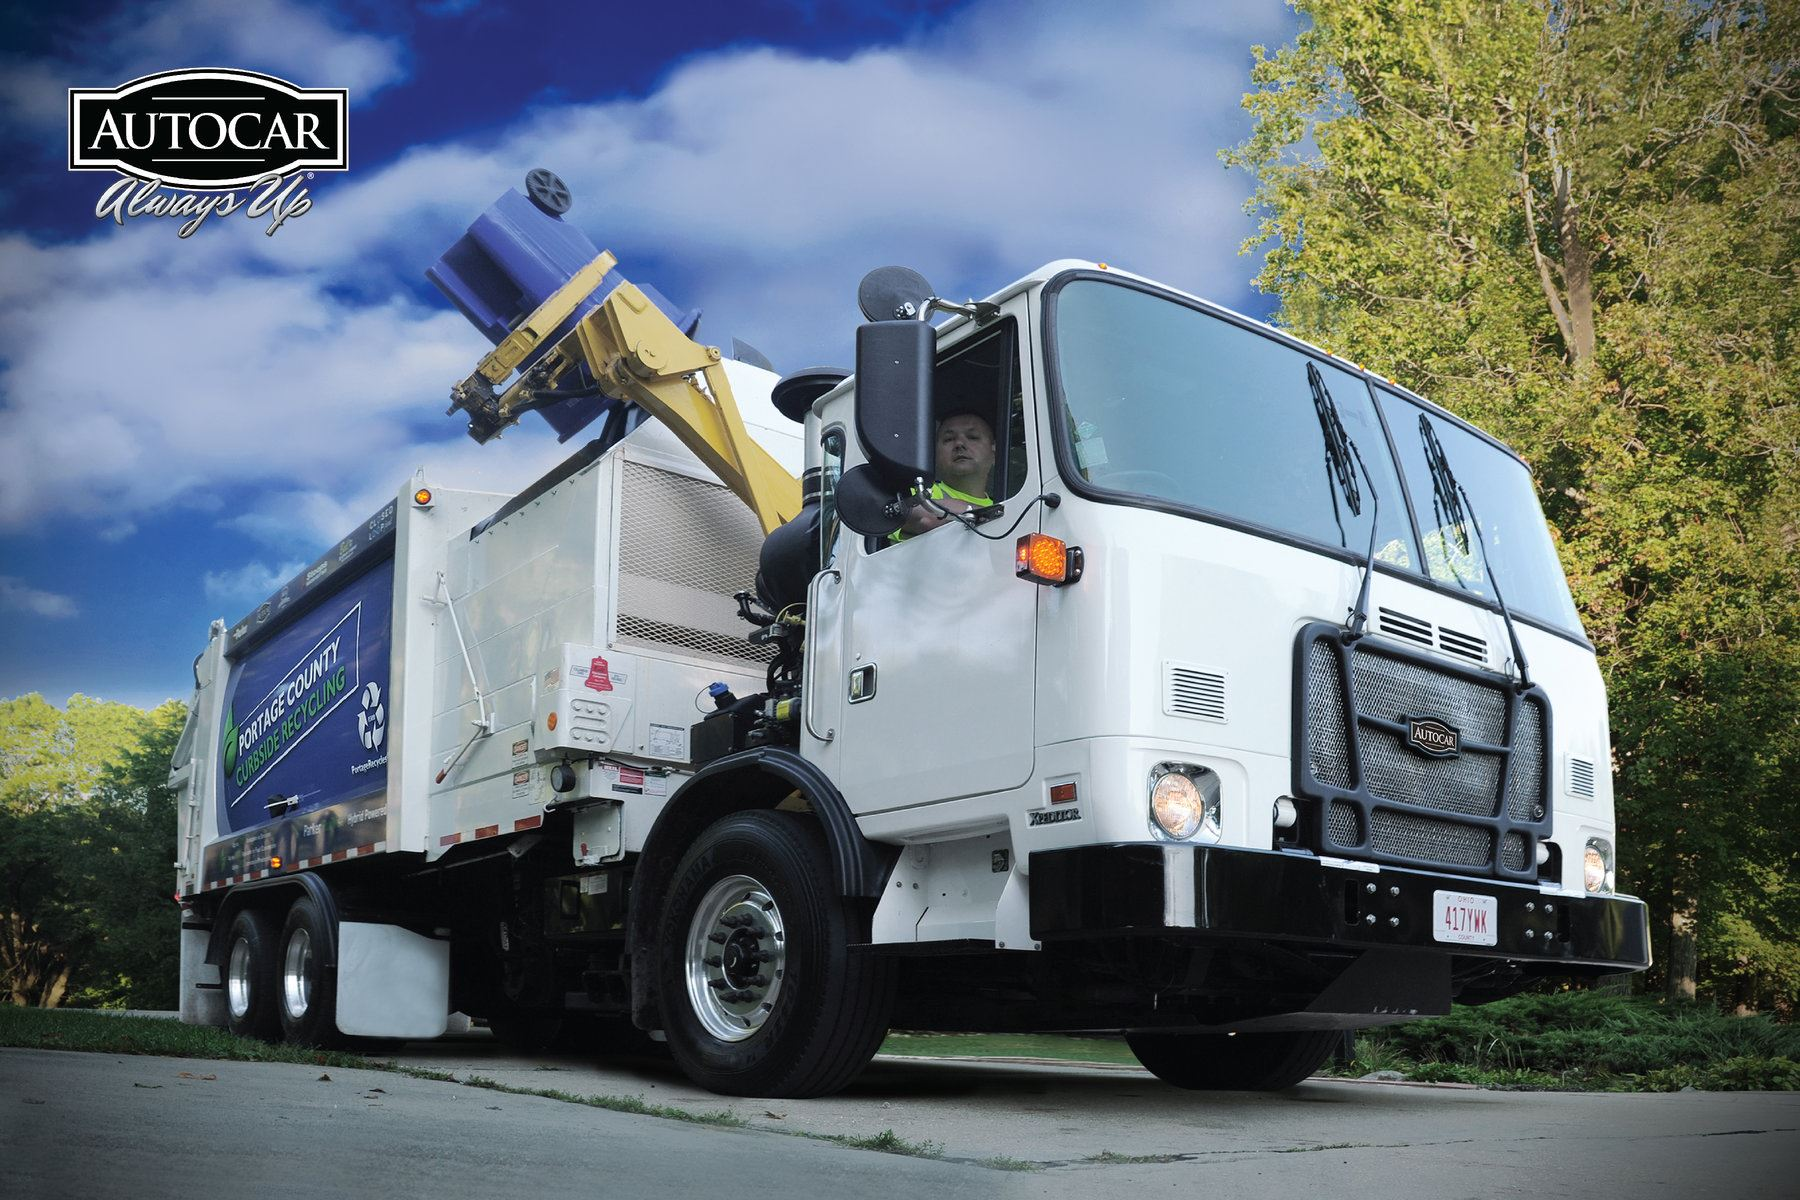 autocar news articles autocar heavy duty trucks rh autocartruck com Autocar Truck Multifunction Wiring-Diagram Autocar Truck Guage Wiring-Diagram